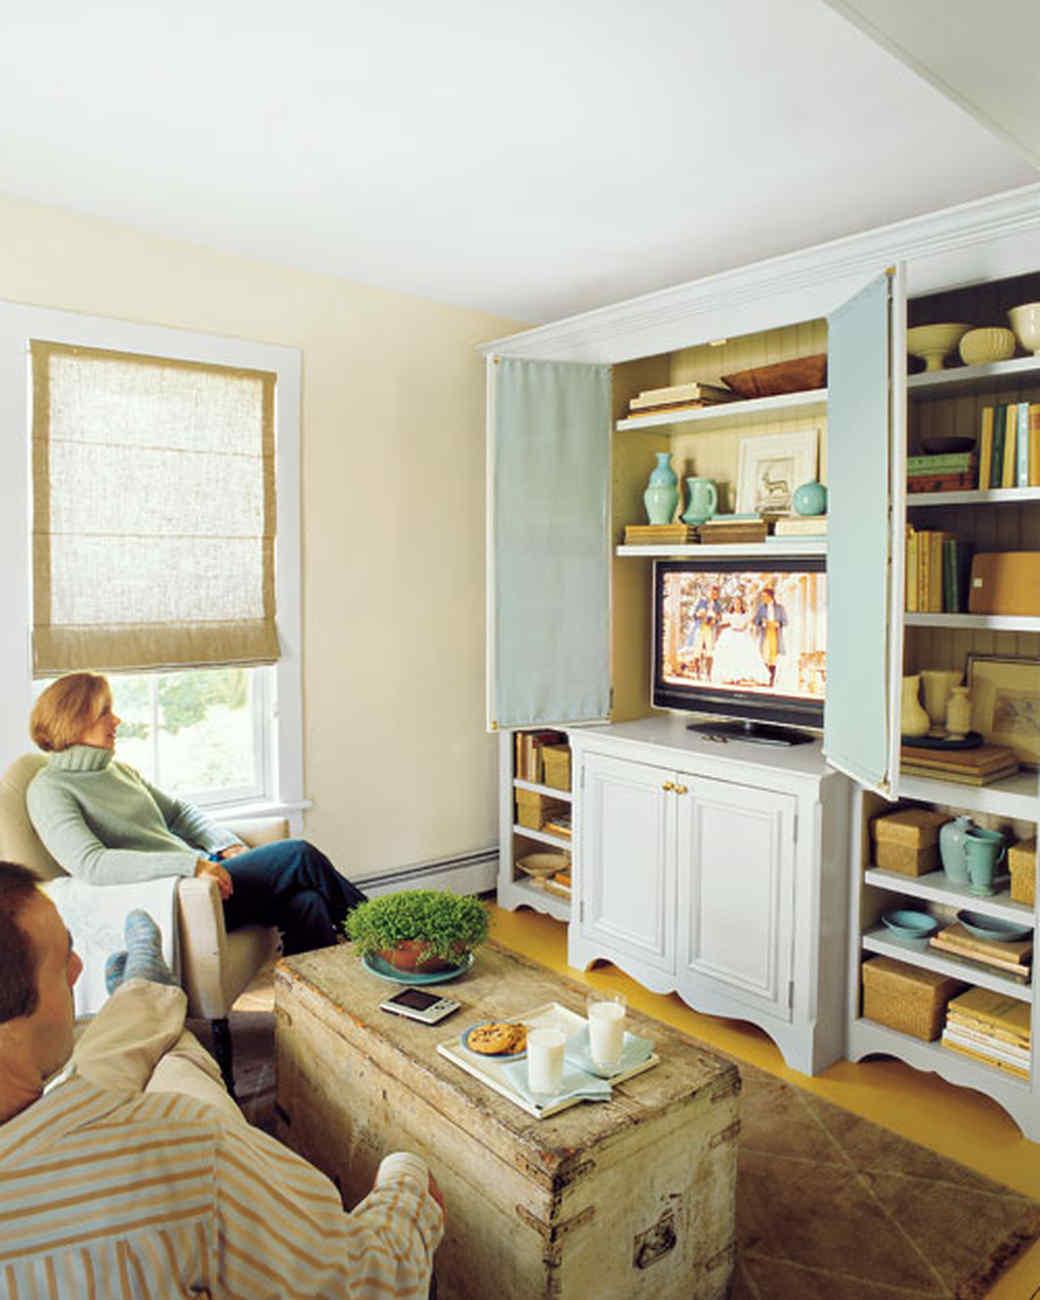 organizing a living room cafe by eplus %e6%b1%82%e4%ba%ba technology in your martha stewart